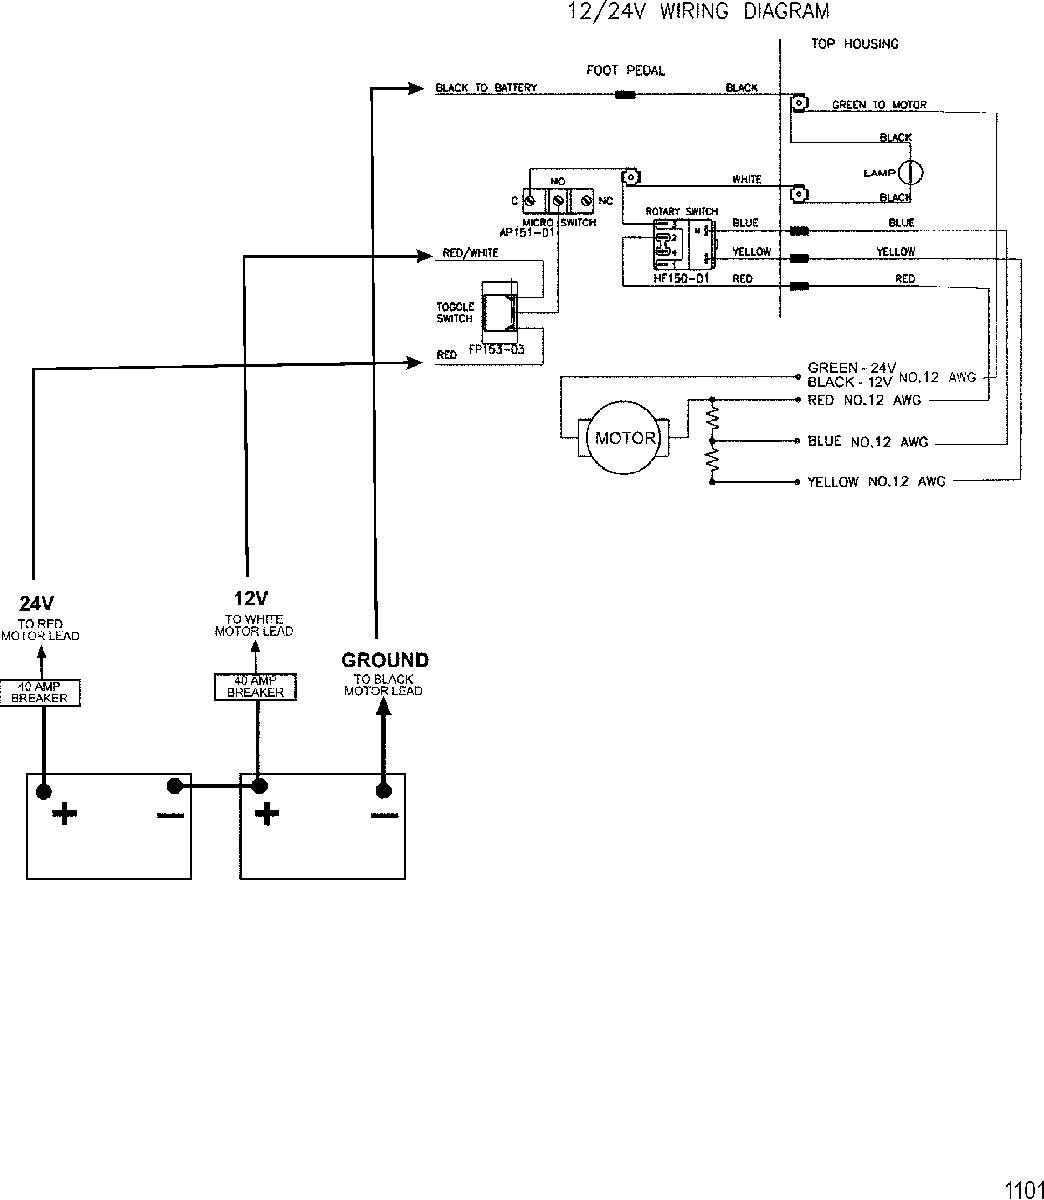 Diagram Razor 24v Motorcycle Wire Diagram Troubleshooting Full Version Hd Quality Diagram Troubleshooting Aiddiagrams Premioaudax It